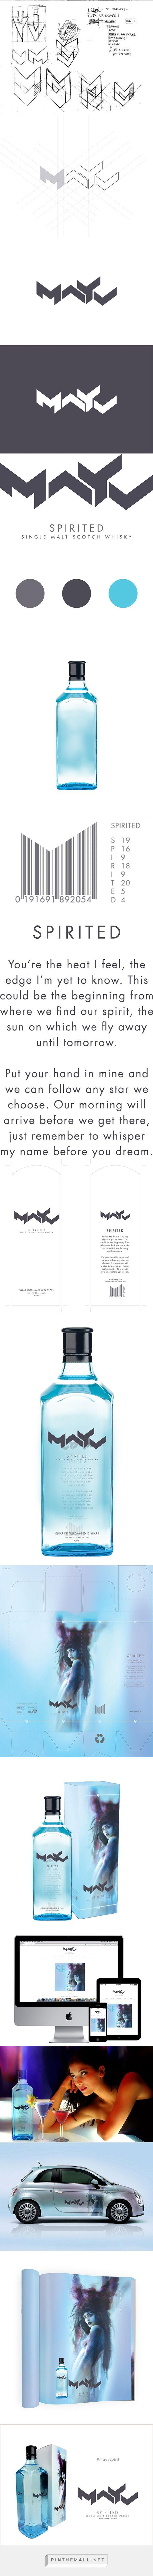 Gorgeous MAYV #mayvspirit on Behance identity #packaging branding by Selena Kidd curated by Packaging Diva PD created via https://www.behance.net/gallery/17500965/MAYV-mayvspirit